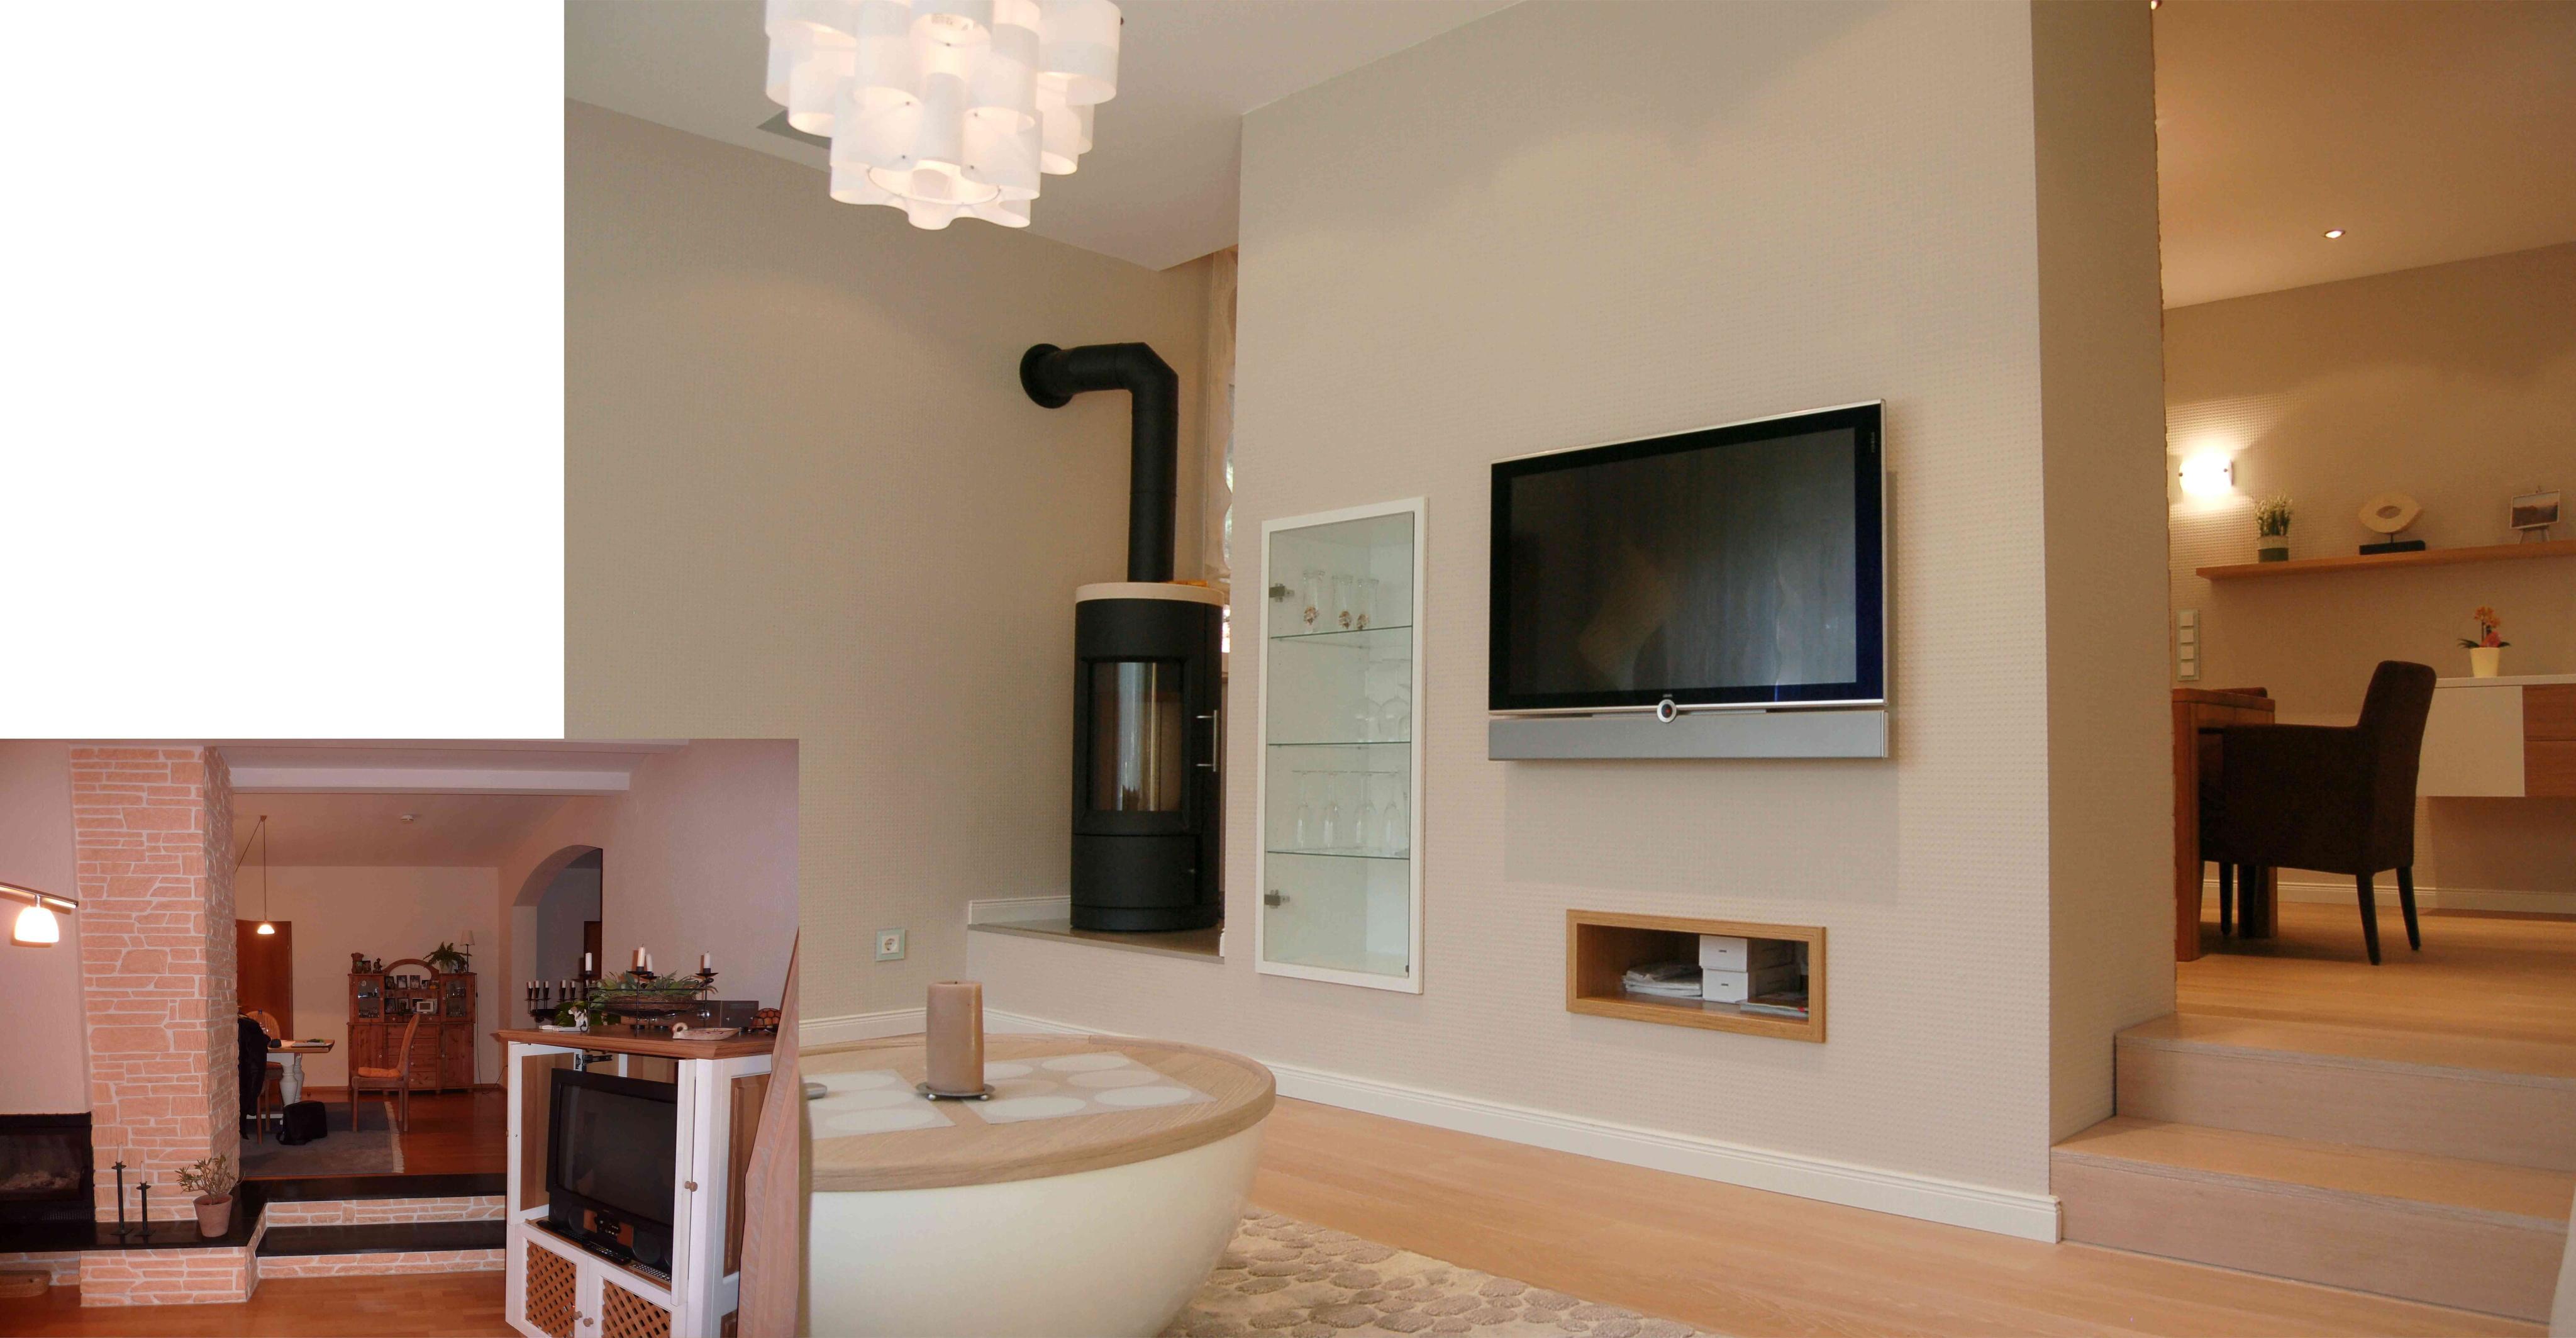 fernseher an wand bilder ideen couchstyle. Black Bedroom Furniture Sets. Home Design Ideas